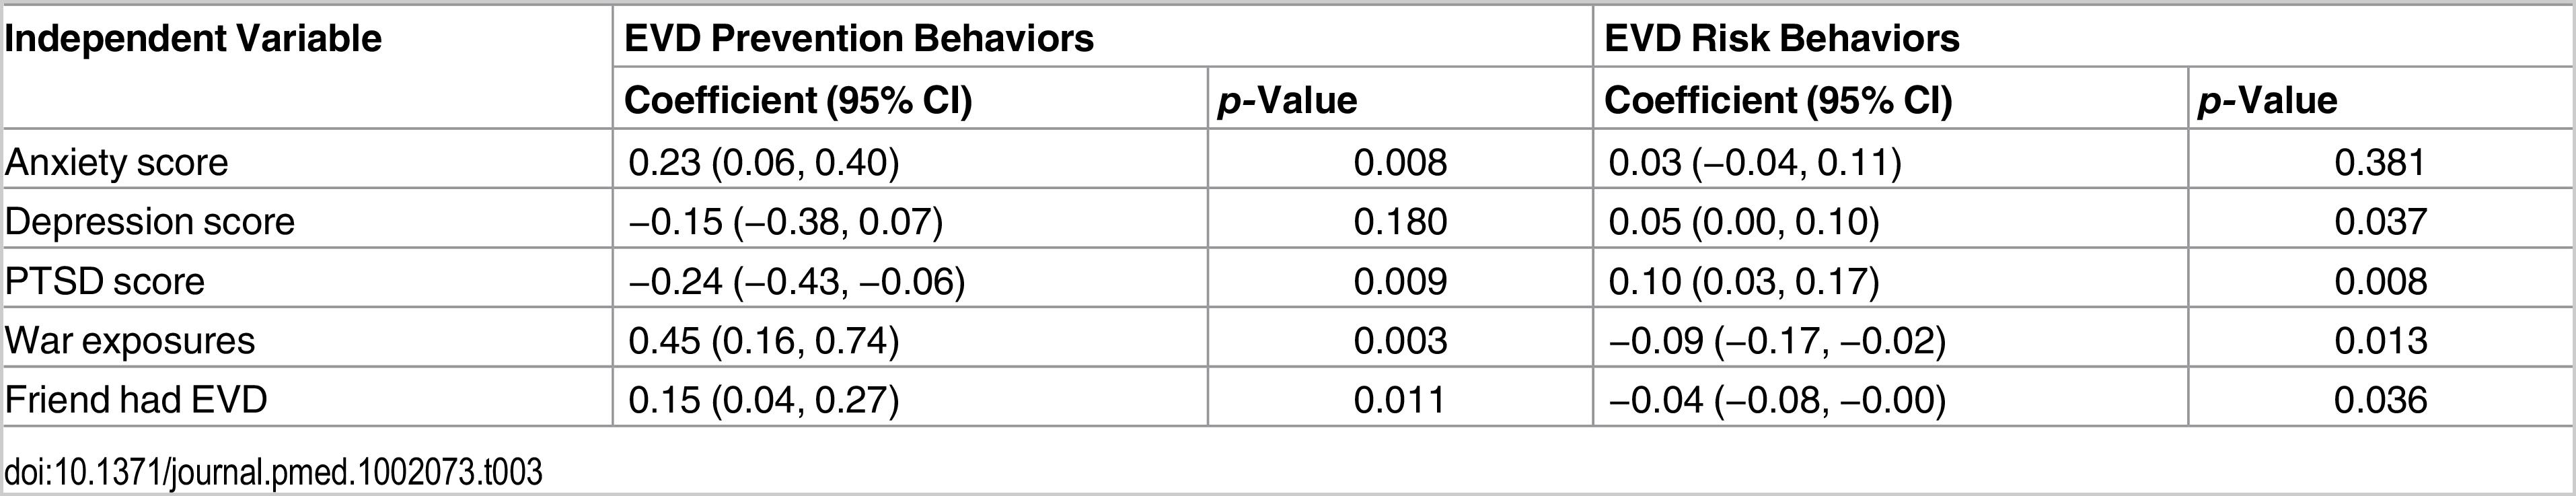 Estimated coefficients predicting EVD prevention and risk behaviors.